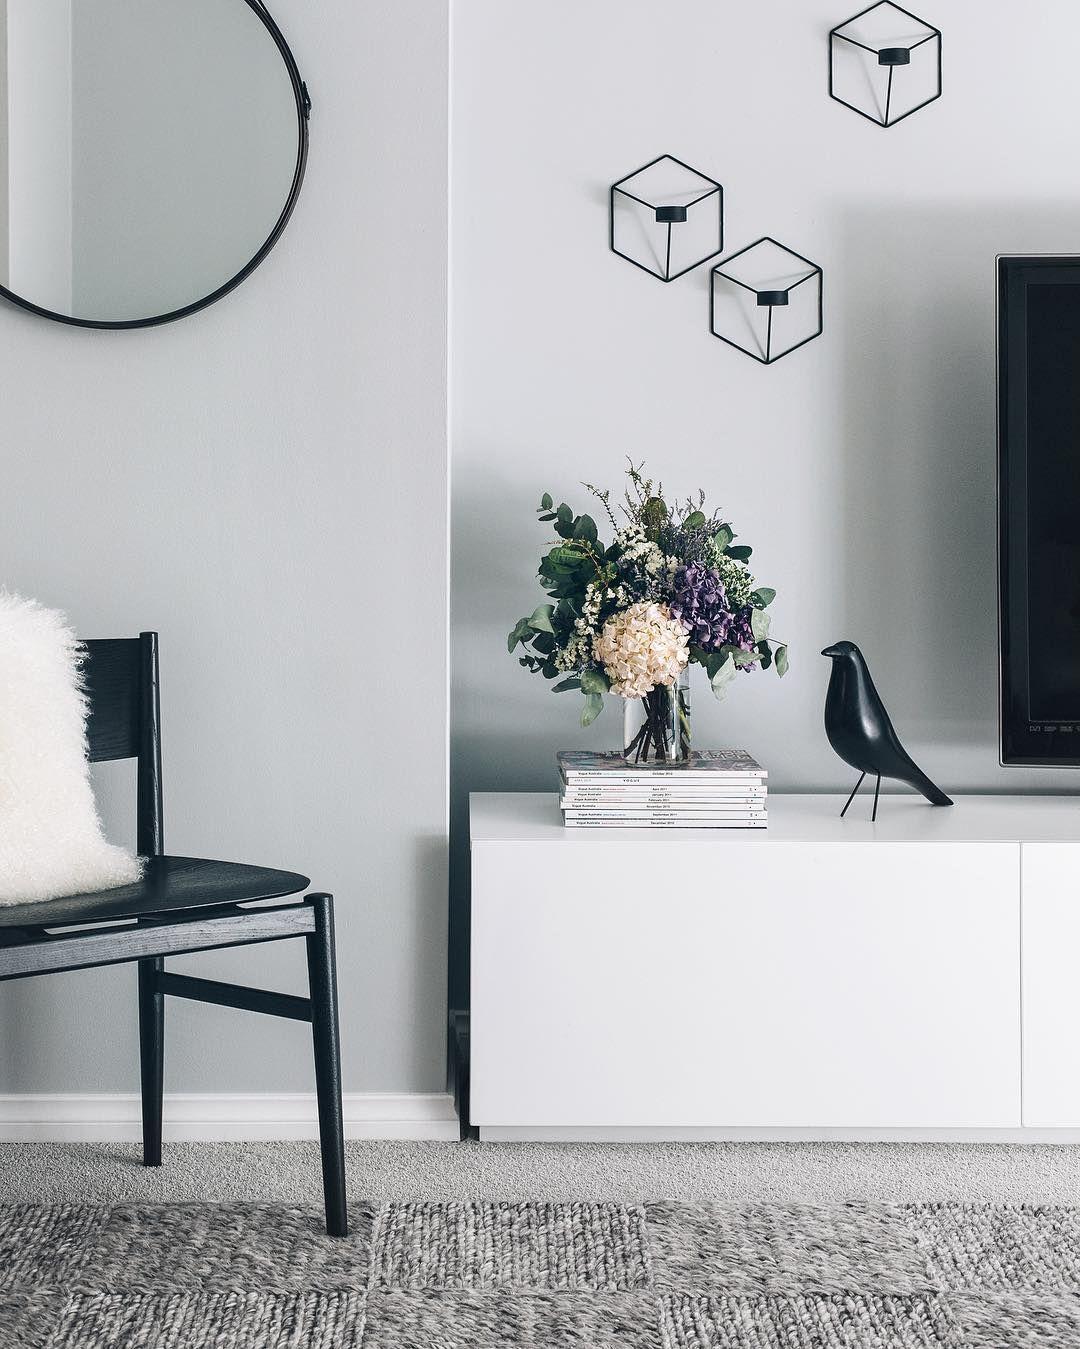 Lieblich Ein Helles Grau Als Wandfarbe Im Wohnzimmer. Www.kolorat.de #KOLORAT # Wandfarbe #Grau